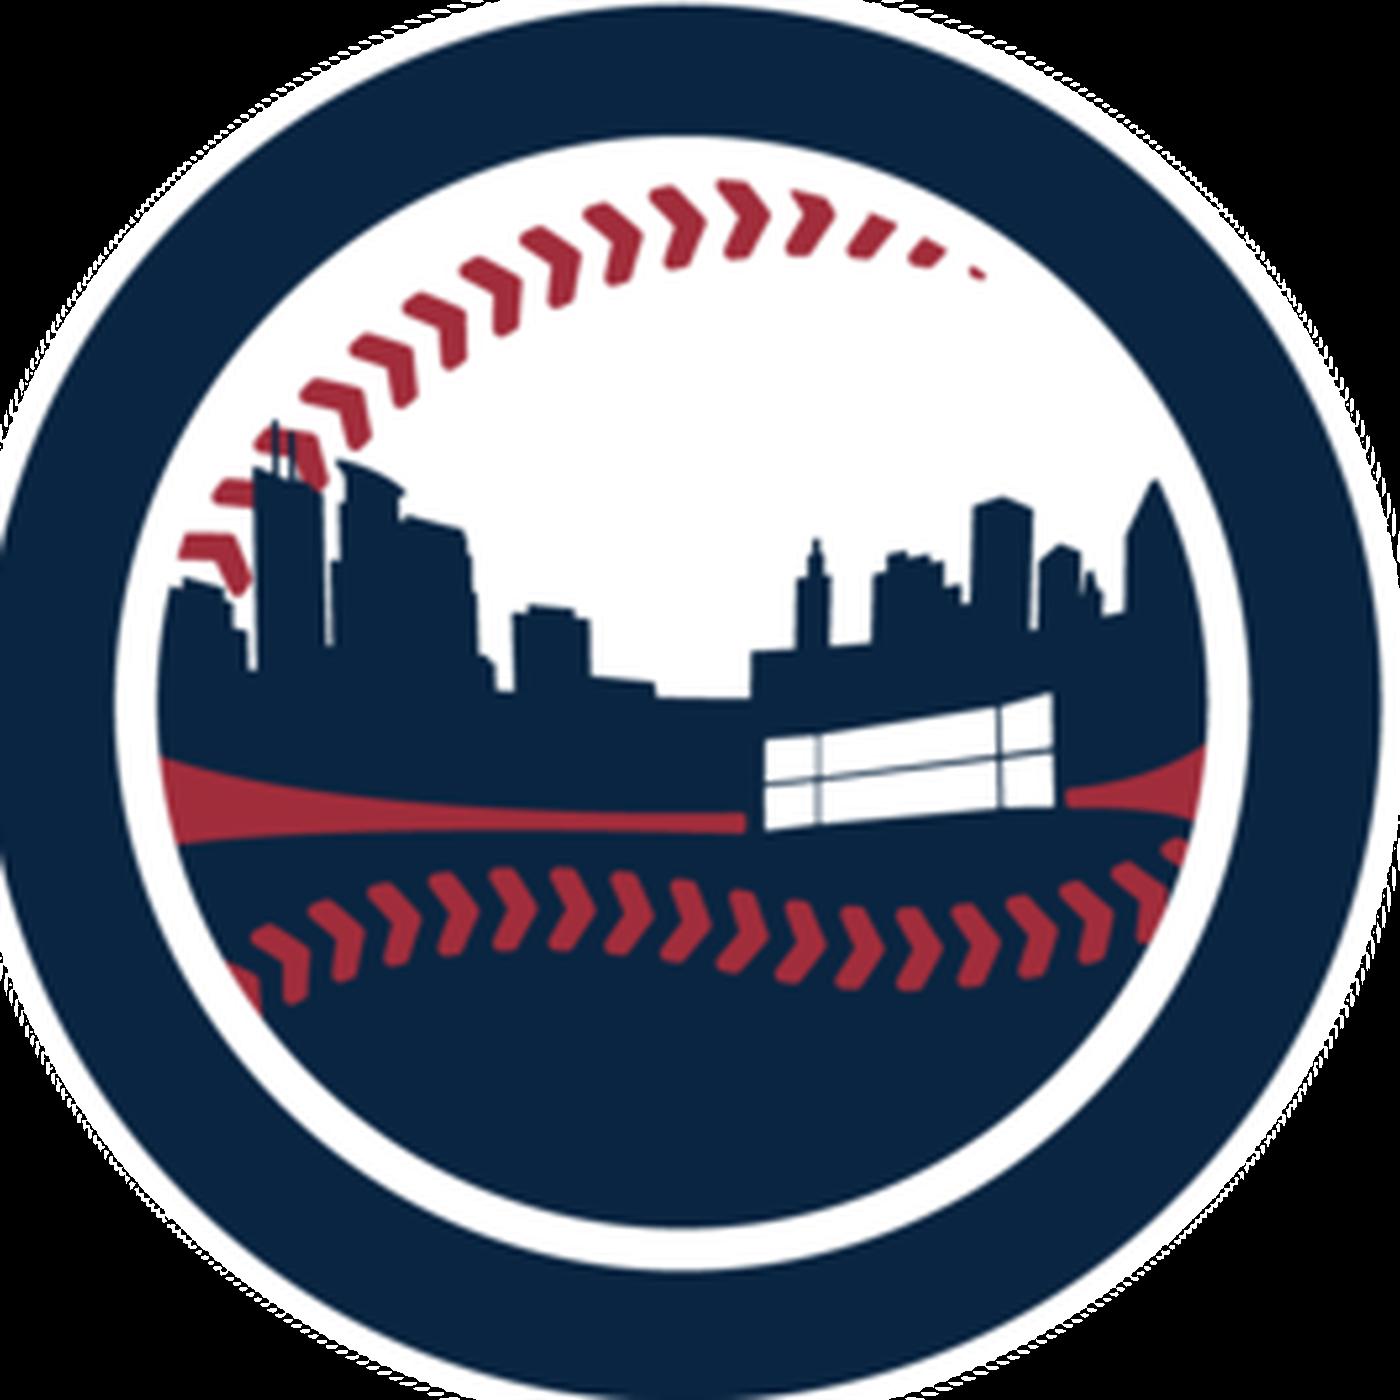 Baseball sandlot clipart vector black and white download Vote: Field of Dreams vs The Sandlot - Twinkie Town vector black and white download